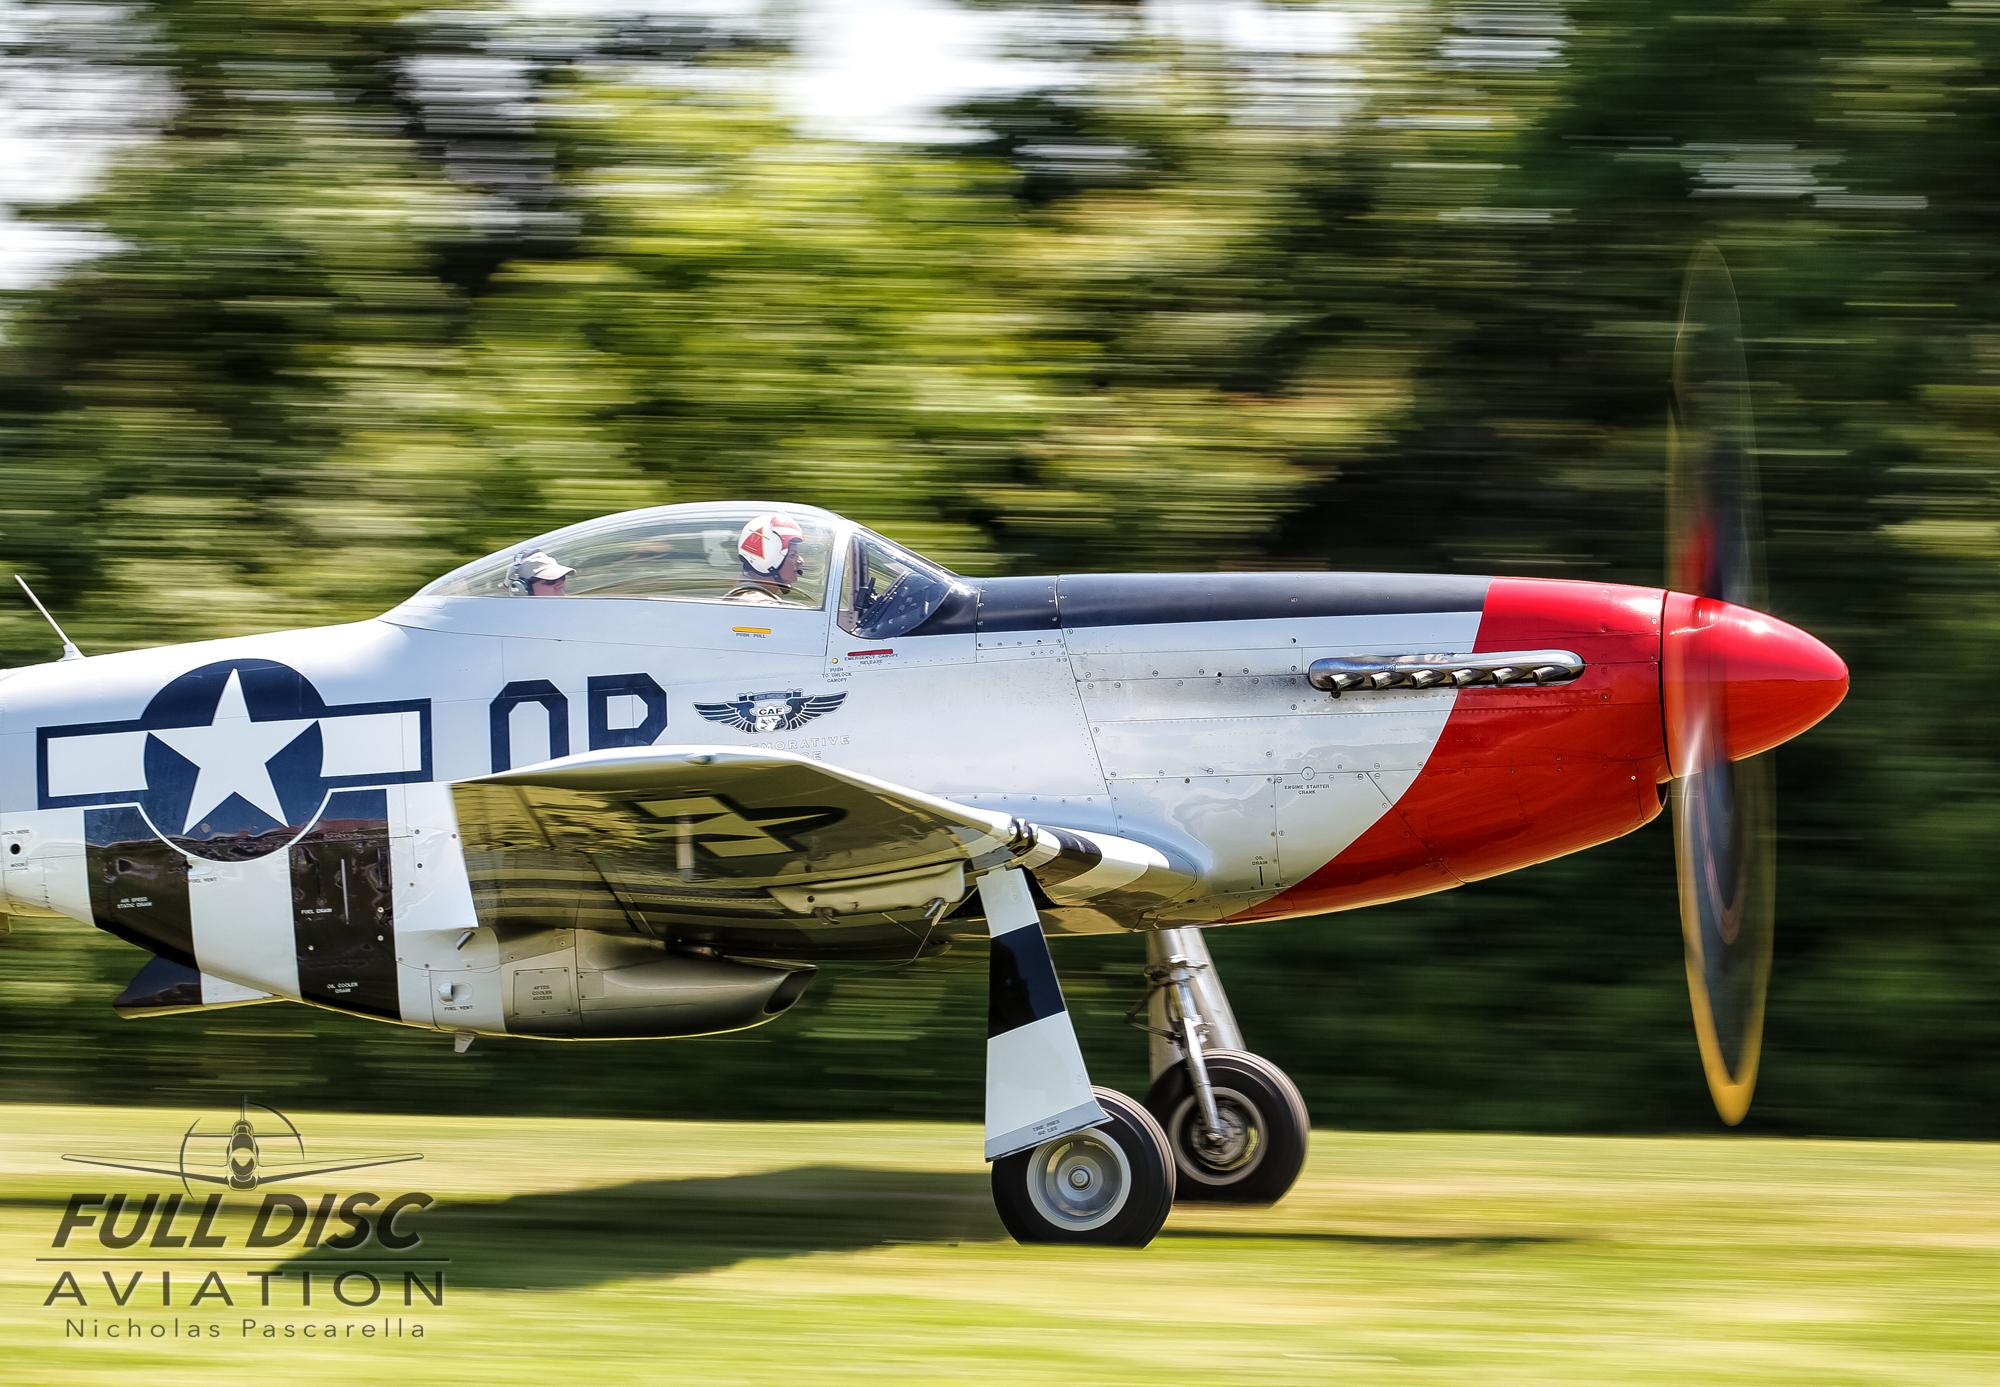 nickpascarella_nicholaspascarella_fulldiscaviation_aircraft_mustang_rednose_takeoff_mam.jpg